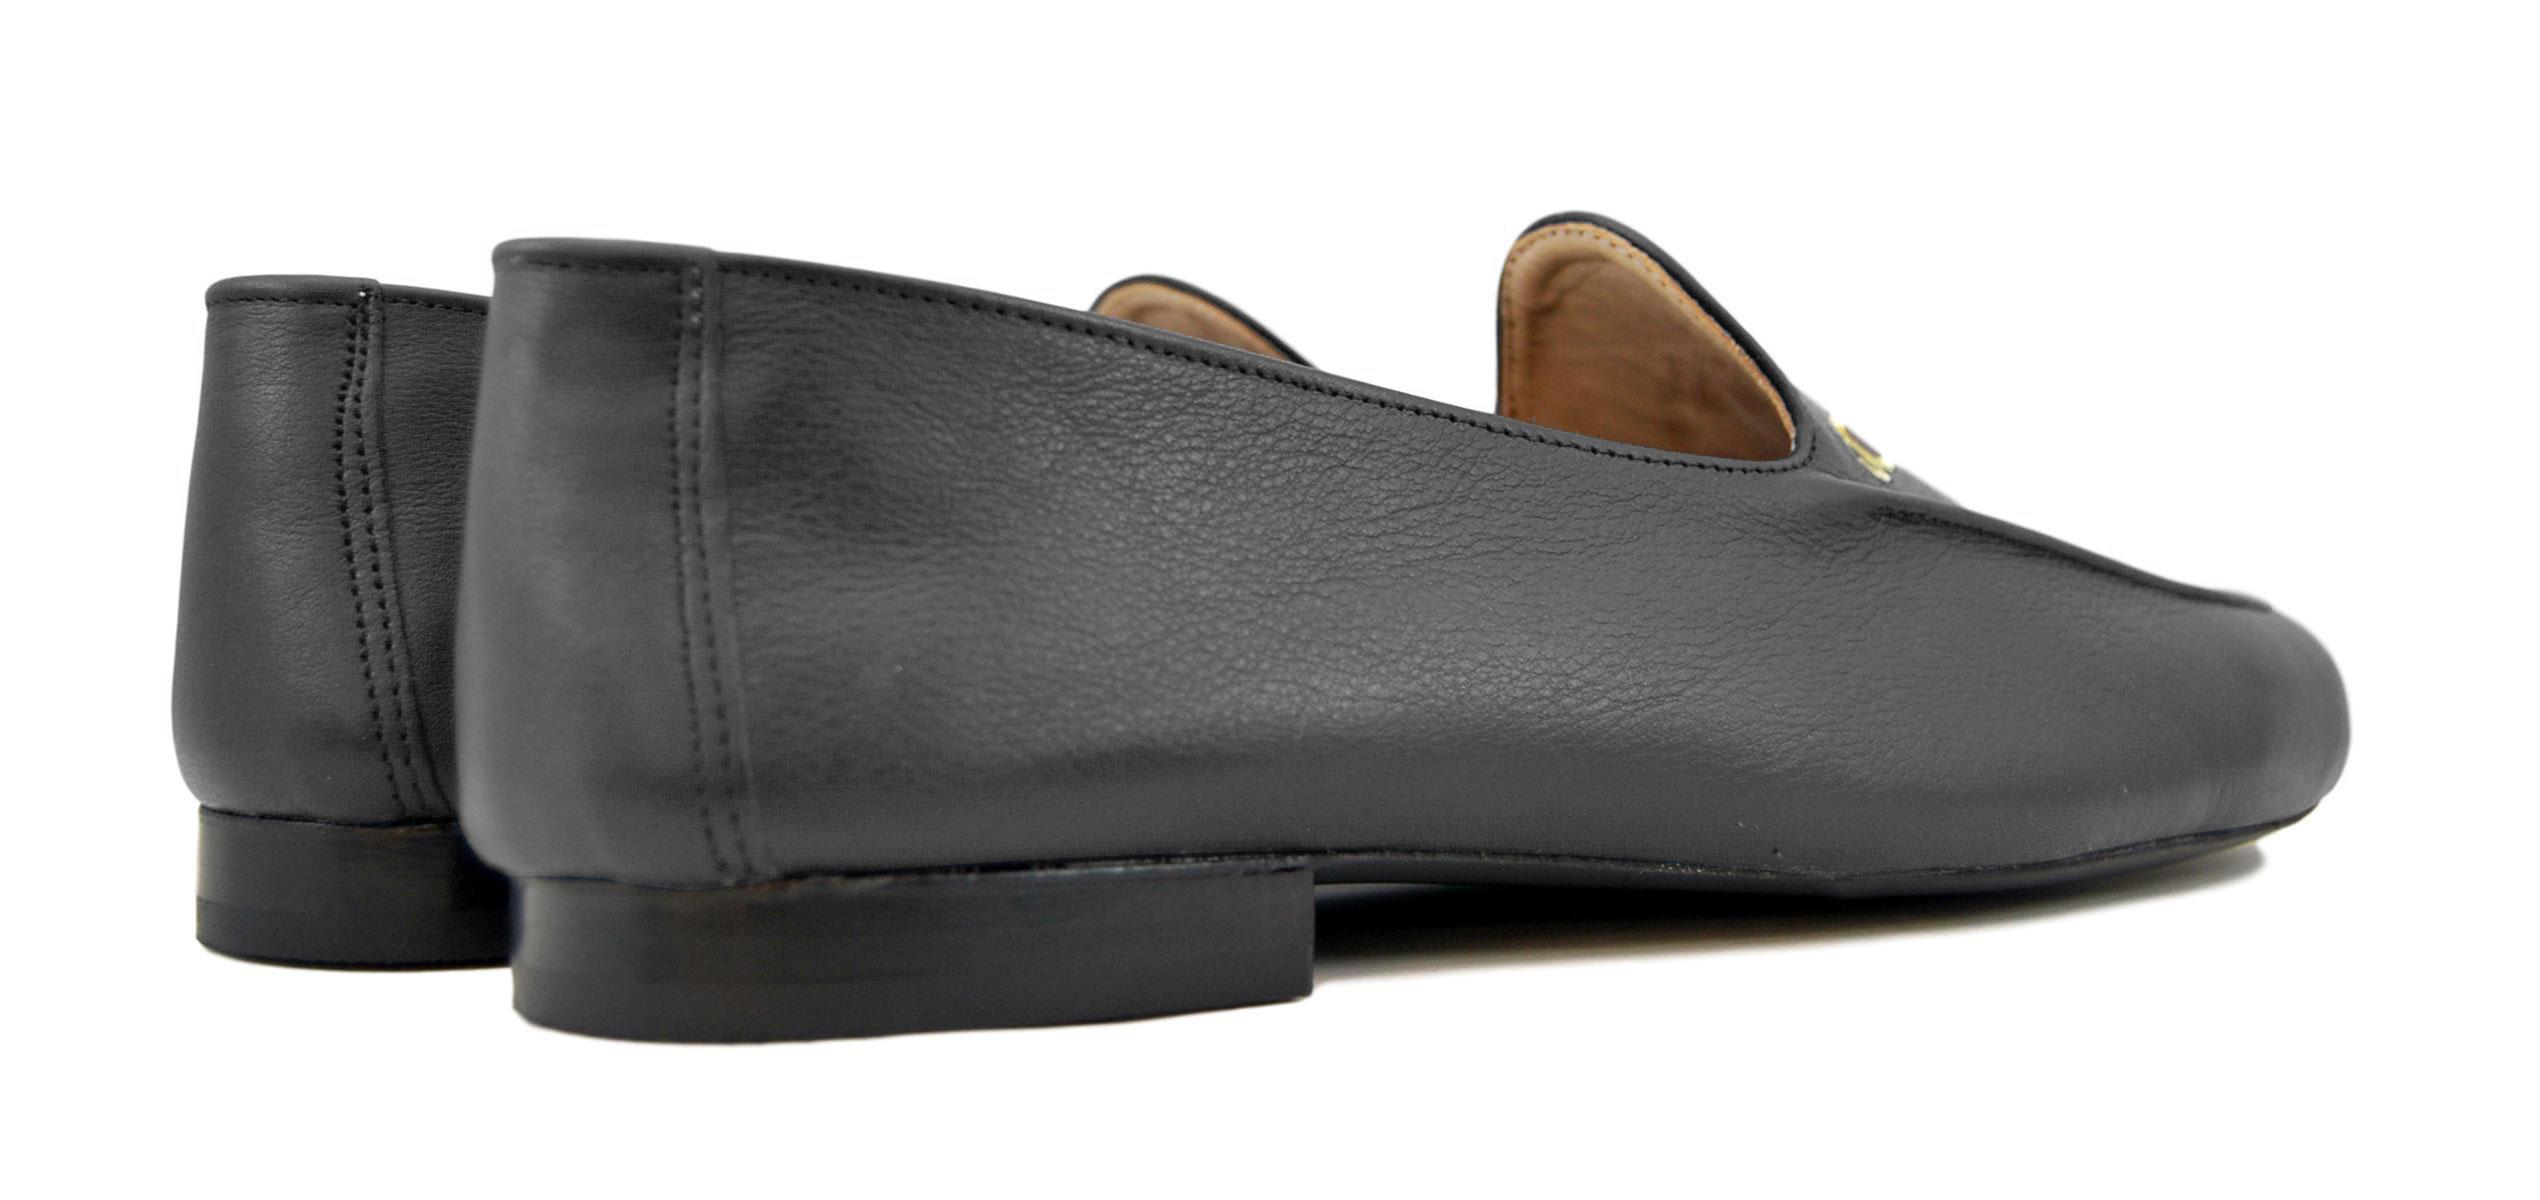 Foto 4 de Zapatos Julio Iglesias 528 JC Souris Piel Napa